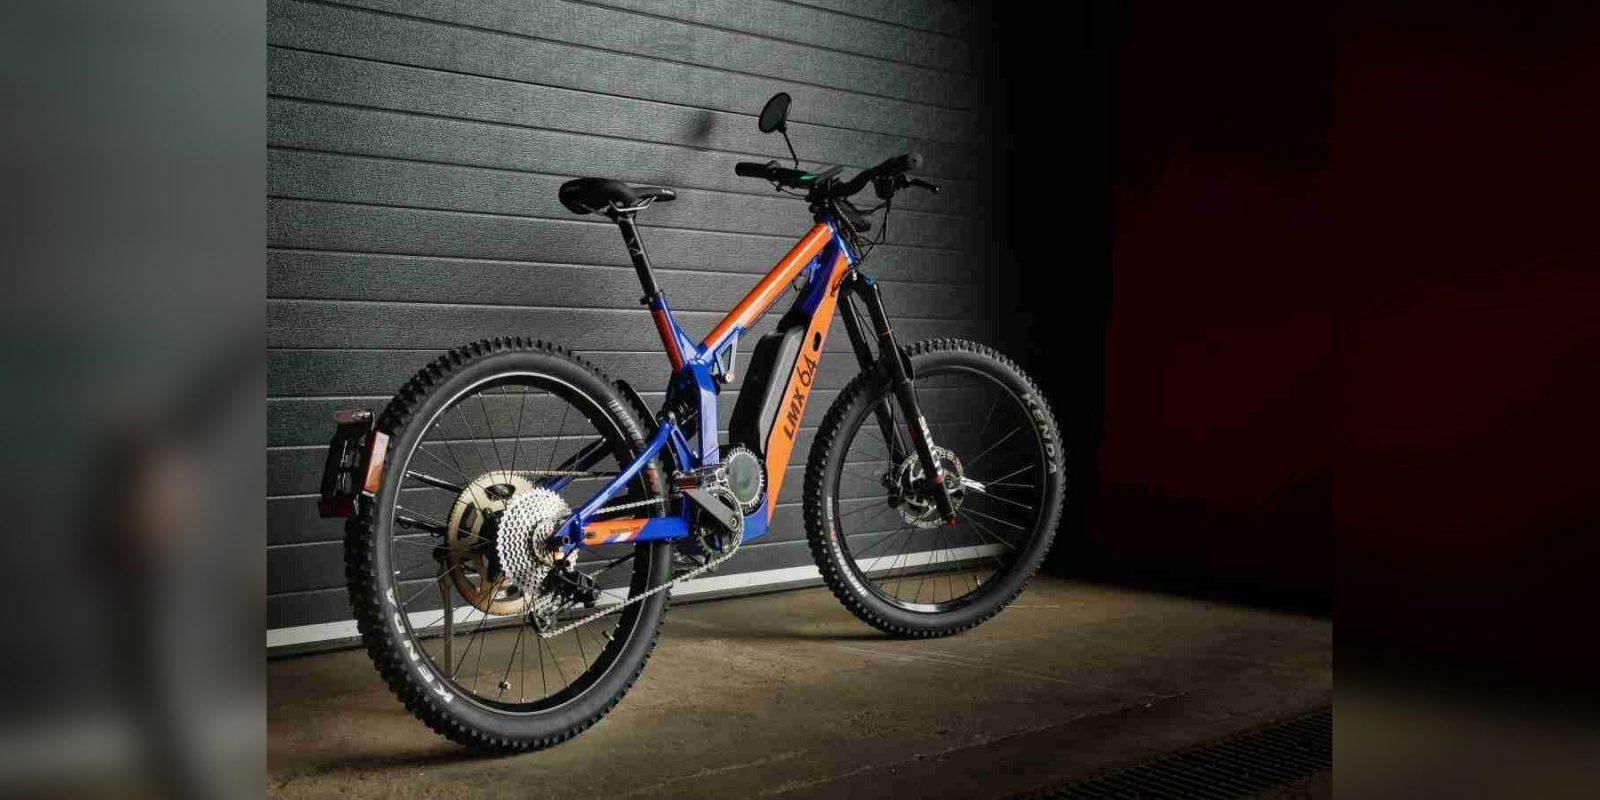 Electric Bike LMX 64H Is Street Legal